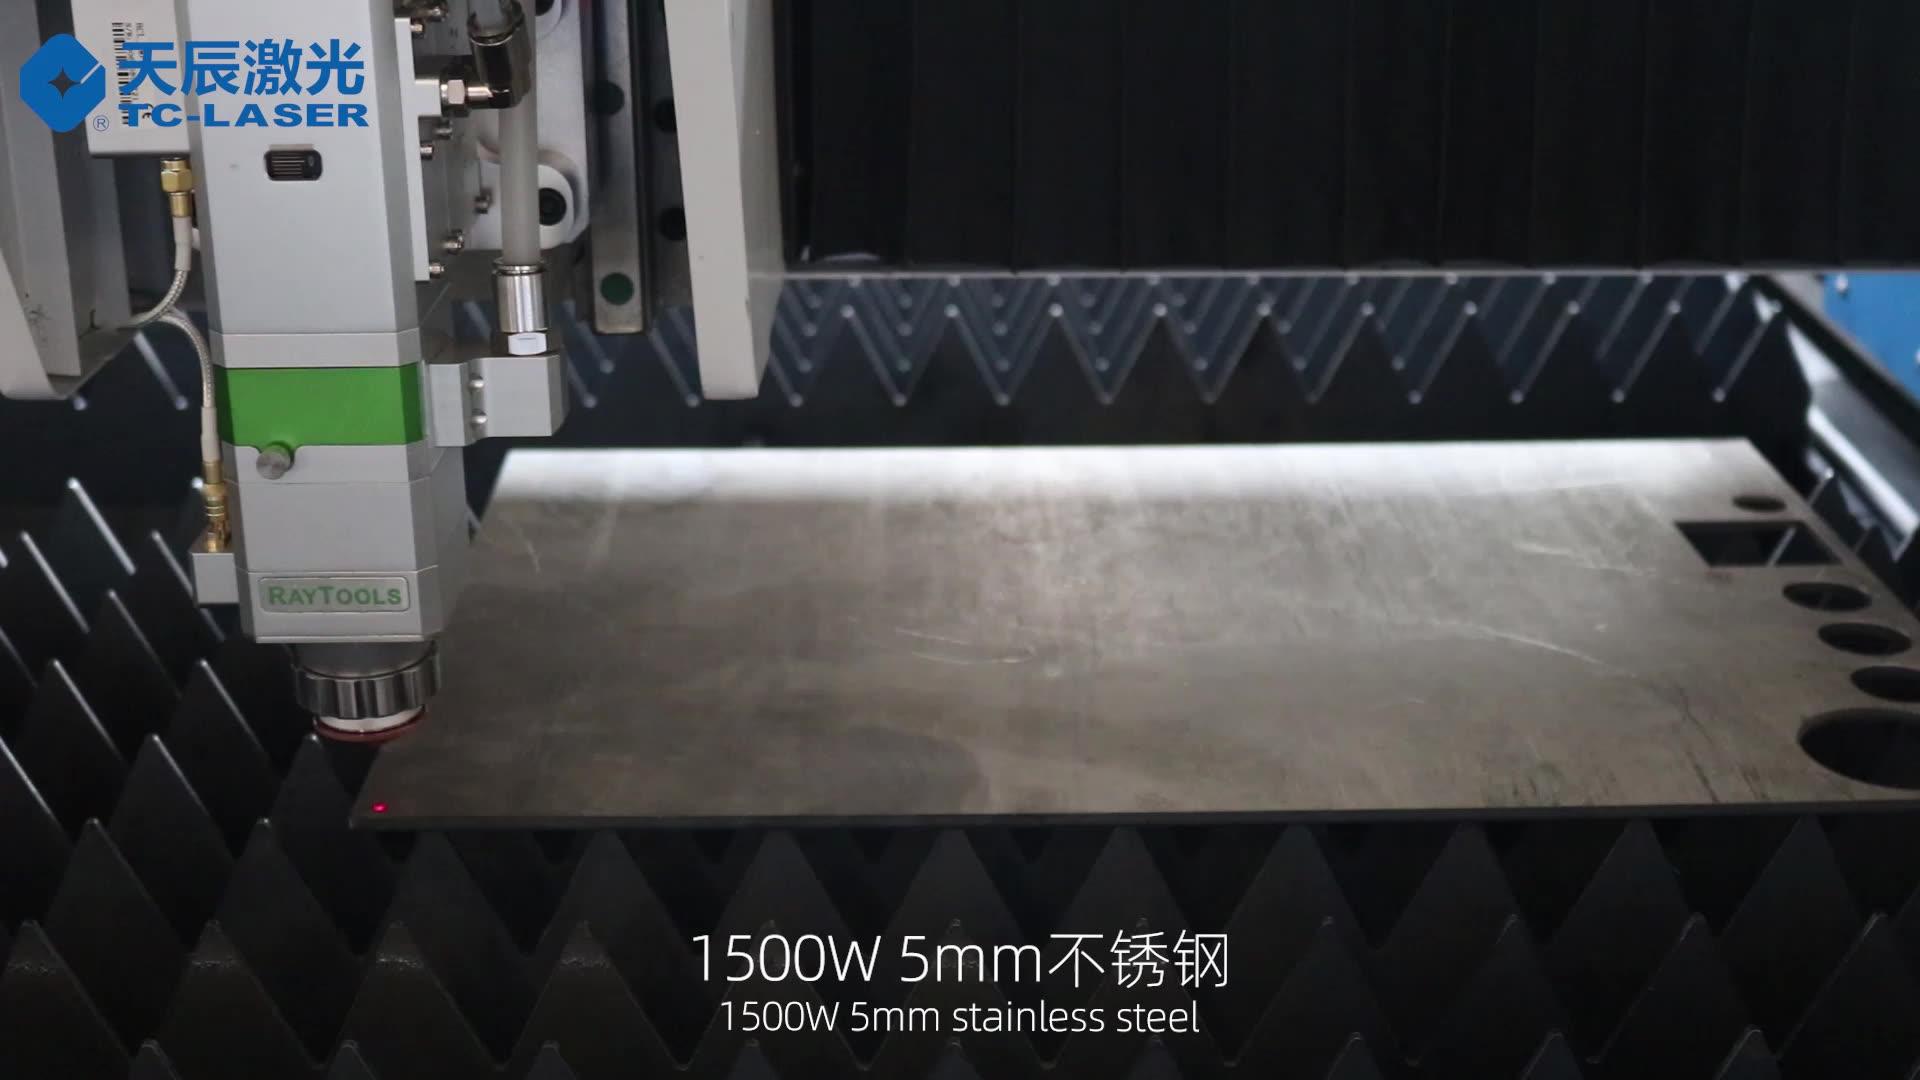 1530 CNC Laser Manufacturer 1000w 2000w Protected Metal fiber cutting machine